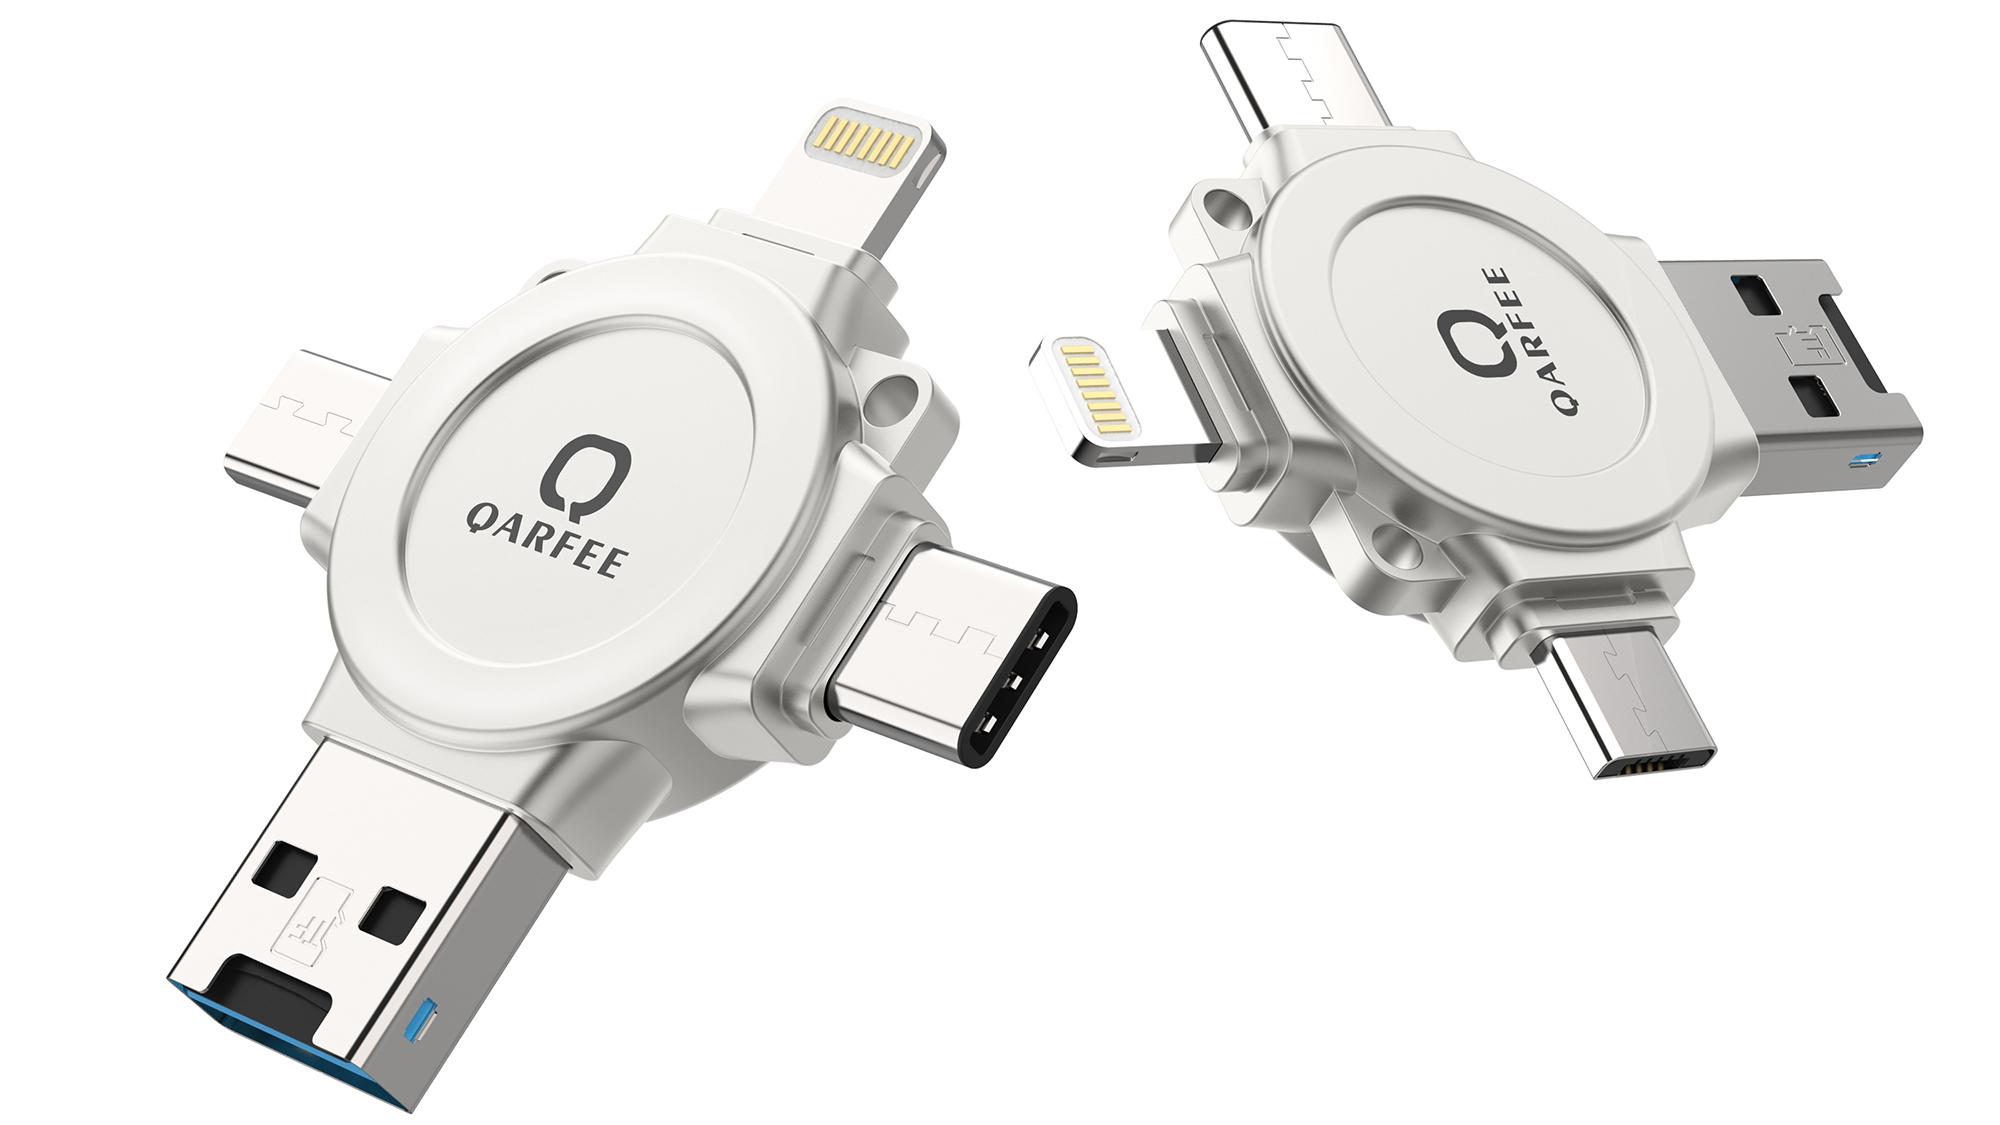 QARFEE-4IN1 32GB Type C USB Flash Drive,Memory Card Reader for Micro SD,Metal...